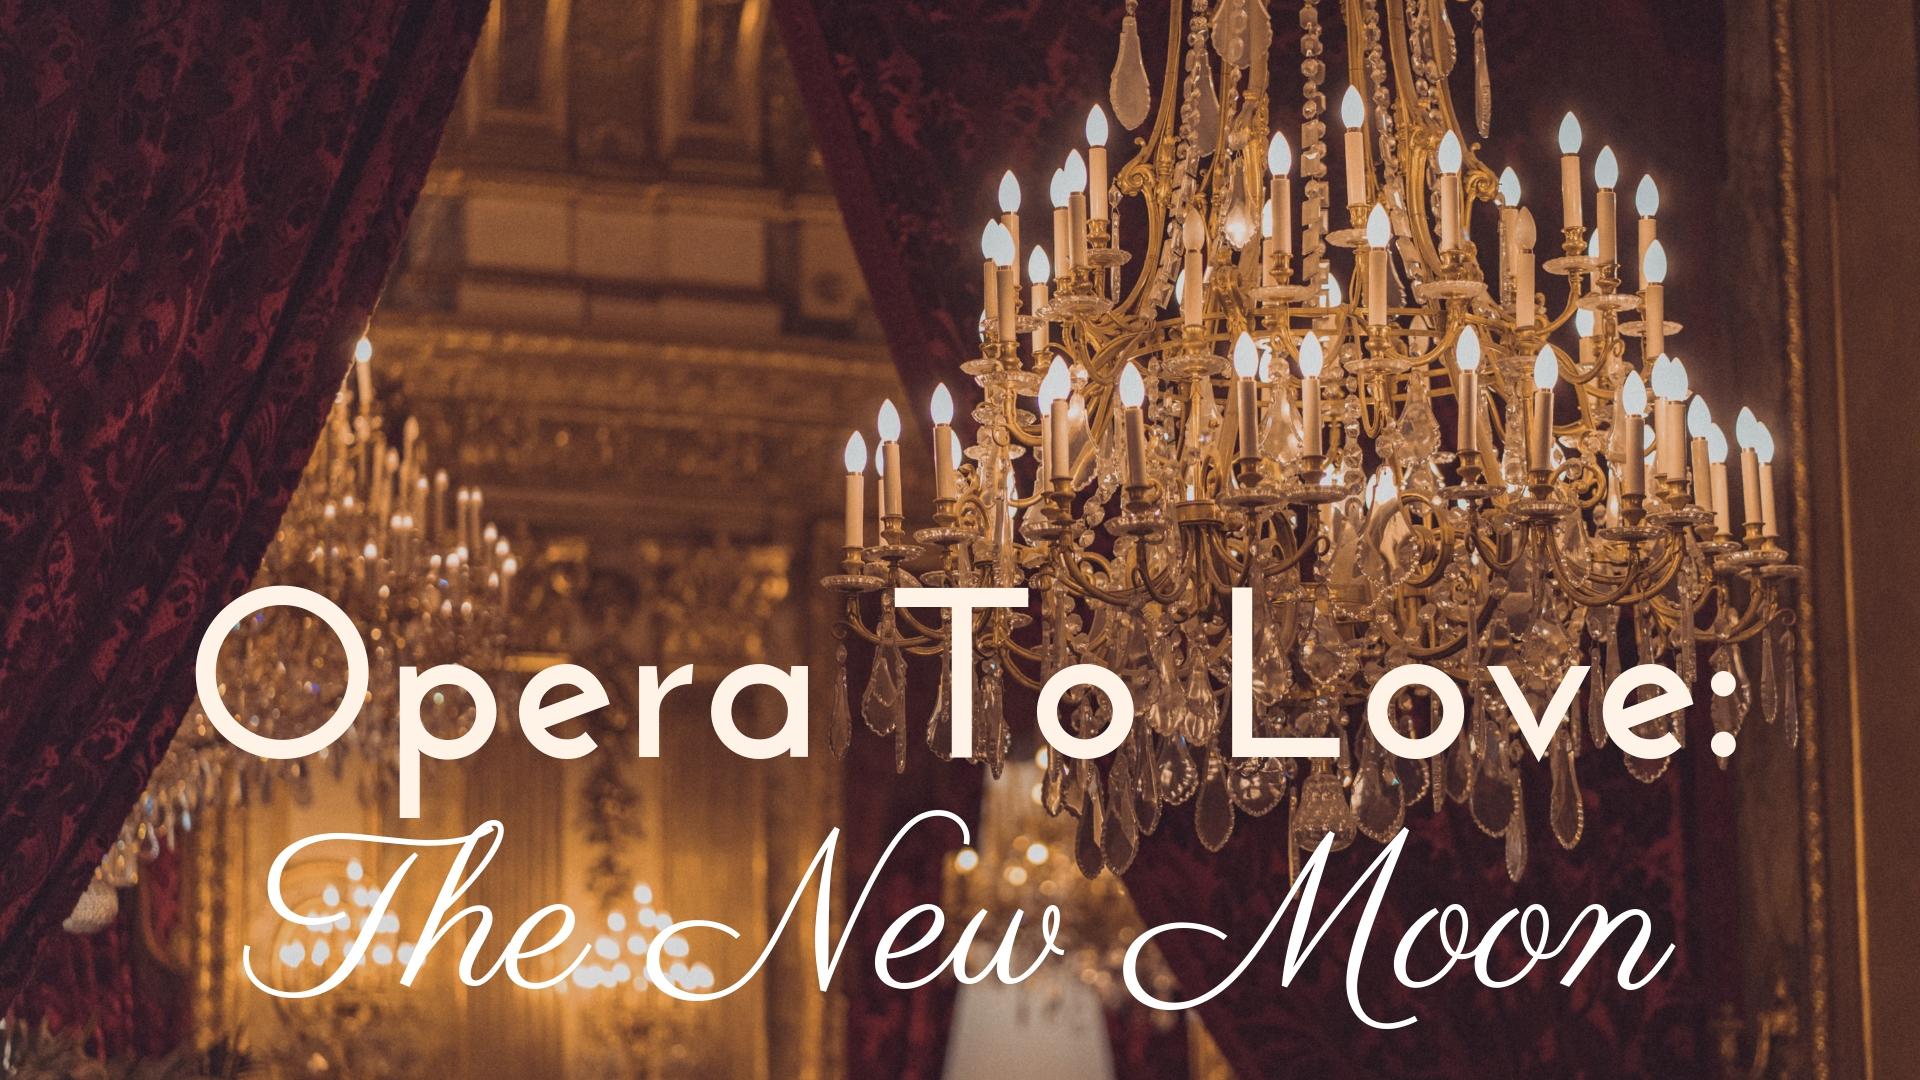 banner-opera-to-love-the-new-moon-01.jpg